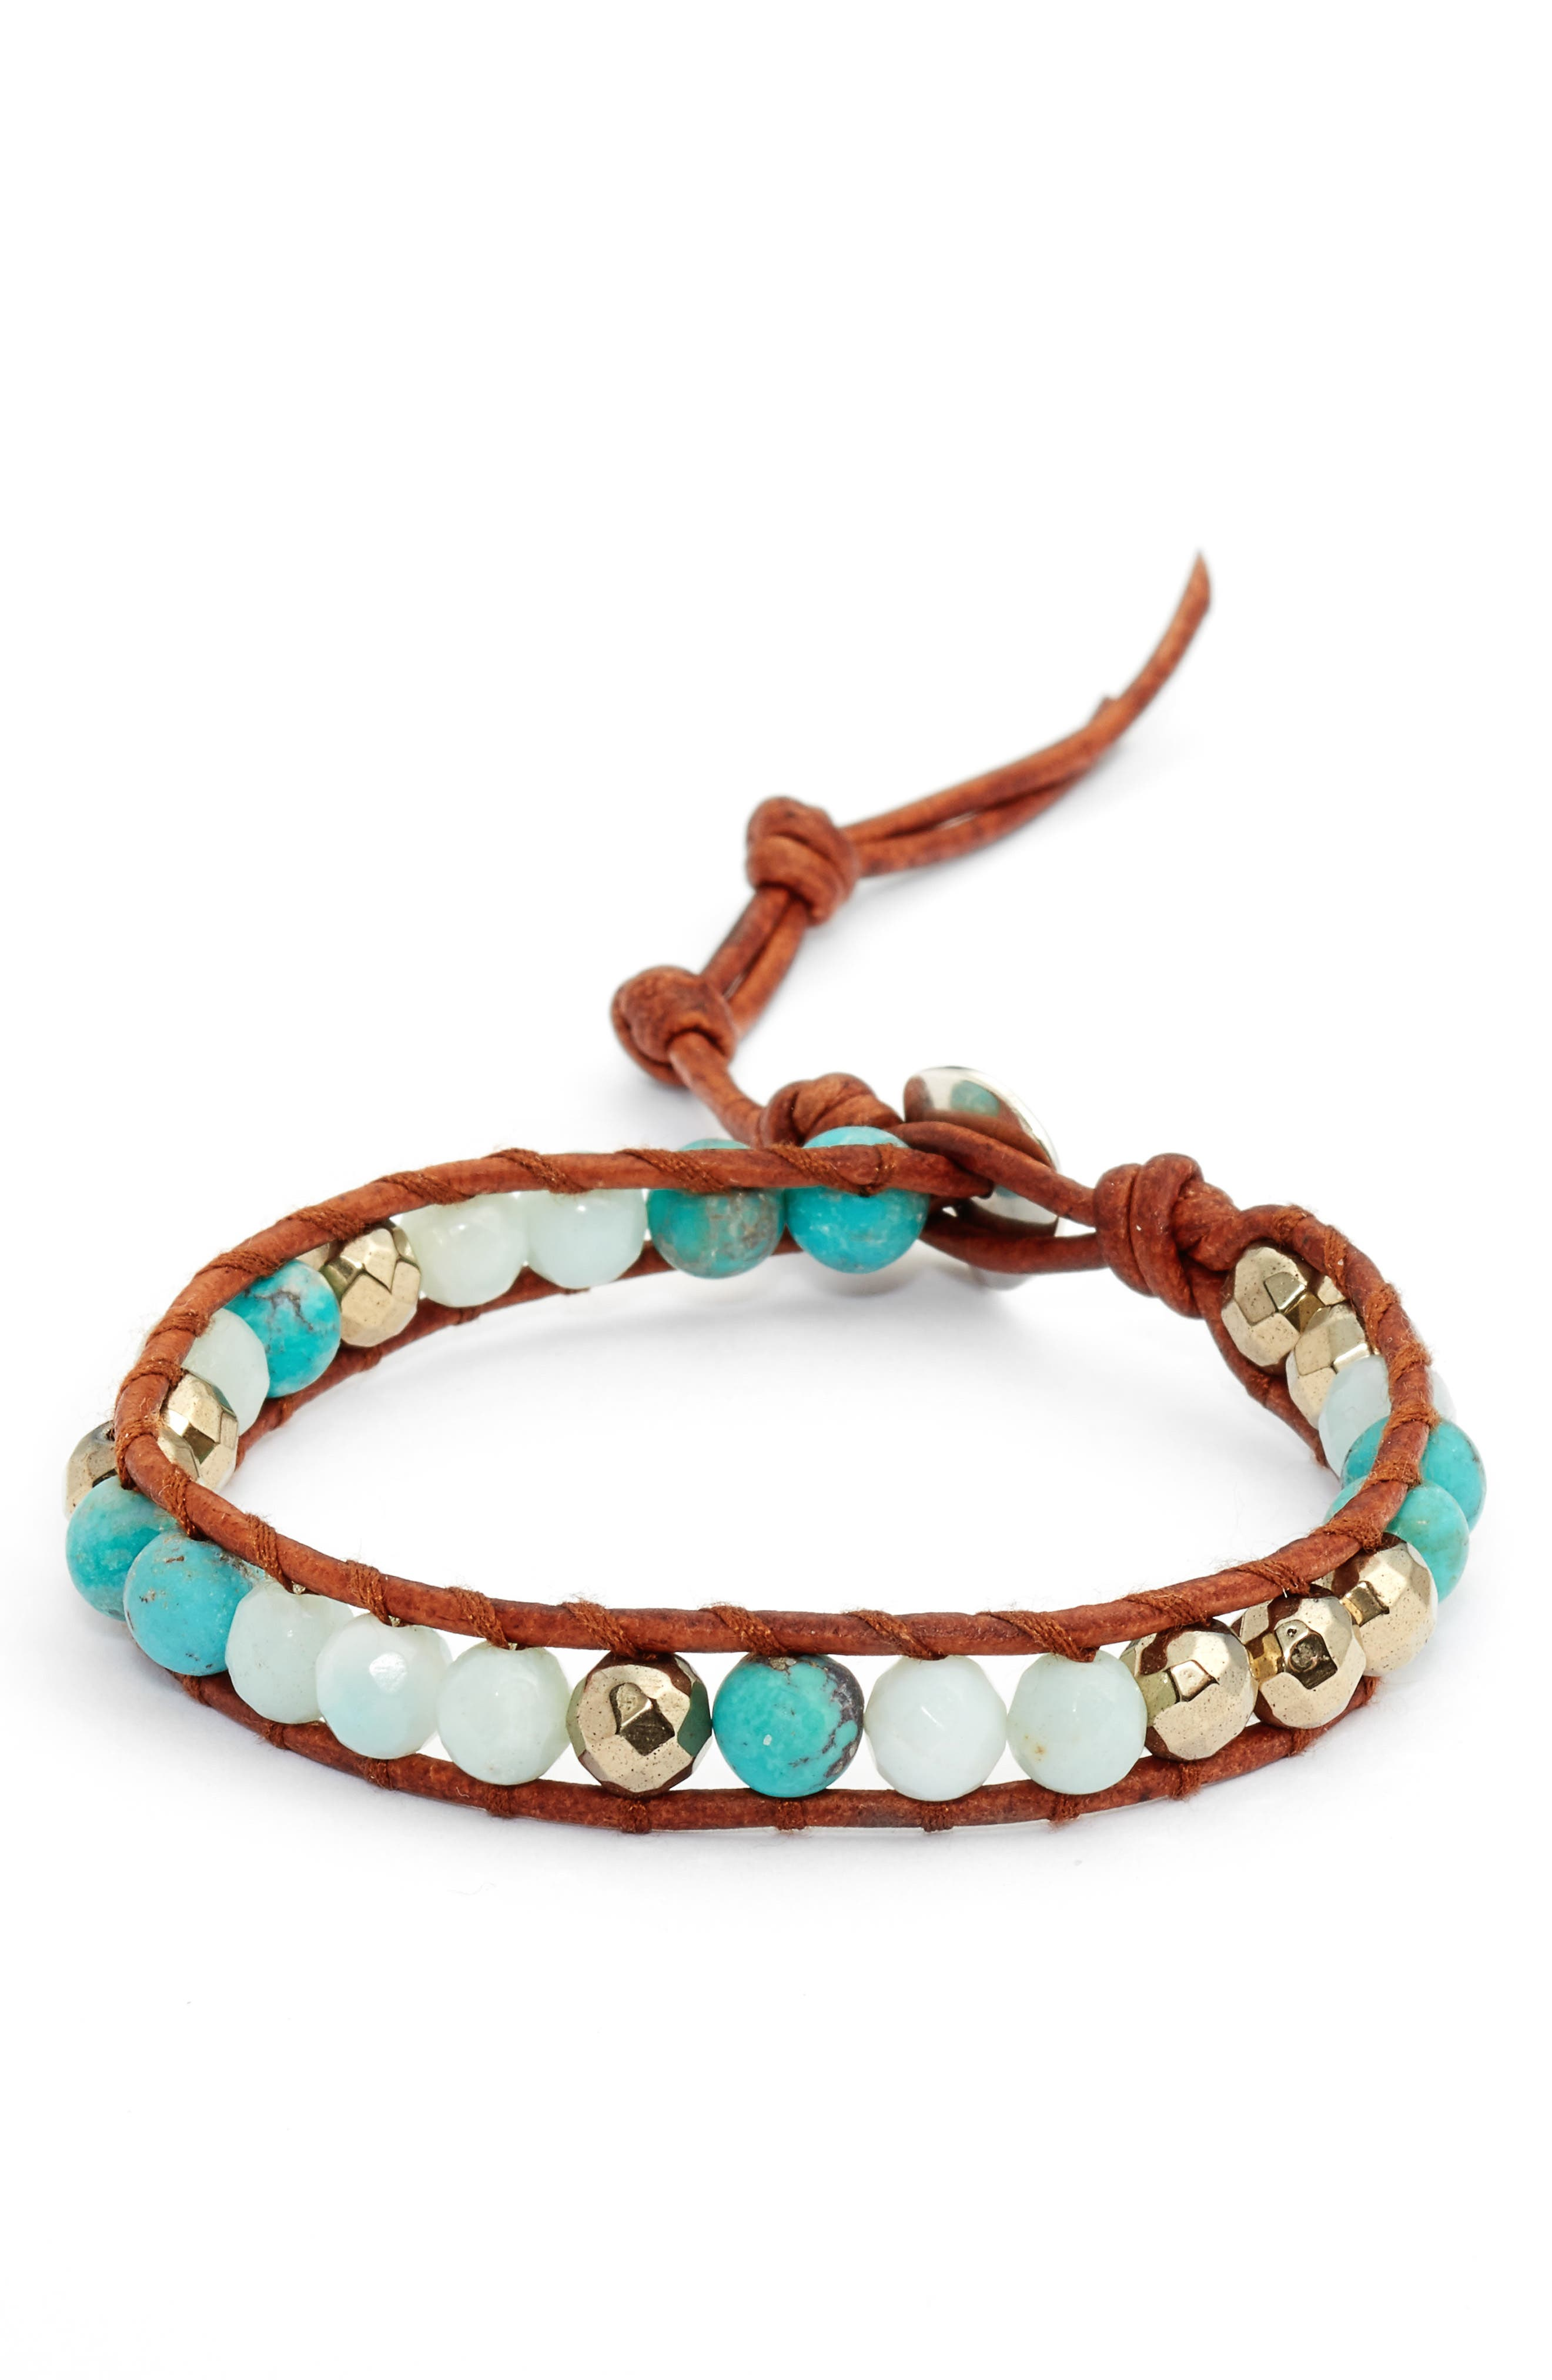 Main Image - Chan Luu Mixed Semiprecious Stone Bracelet